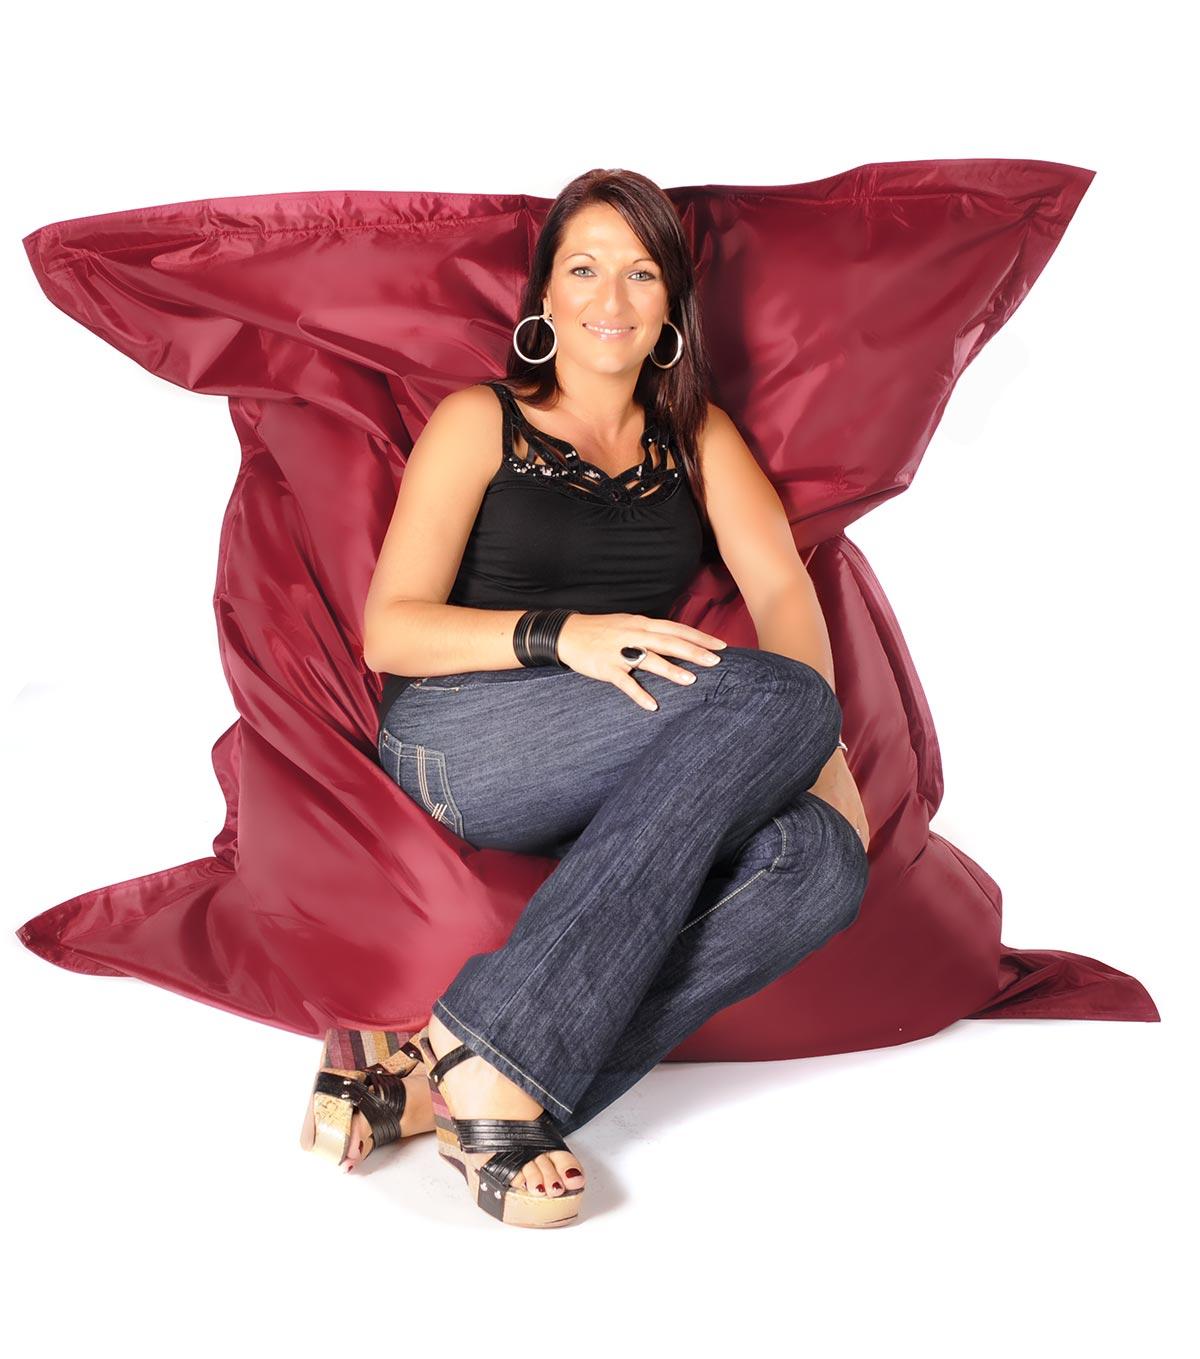 pouf geant pas cher pouf gant sac billes with pouf geant pas cher cheap justhome maxi pouf. Black Bedroom Furniture Sets. Home Design Ideas